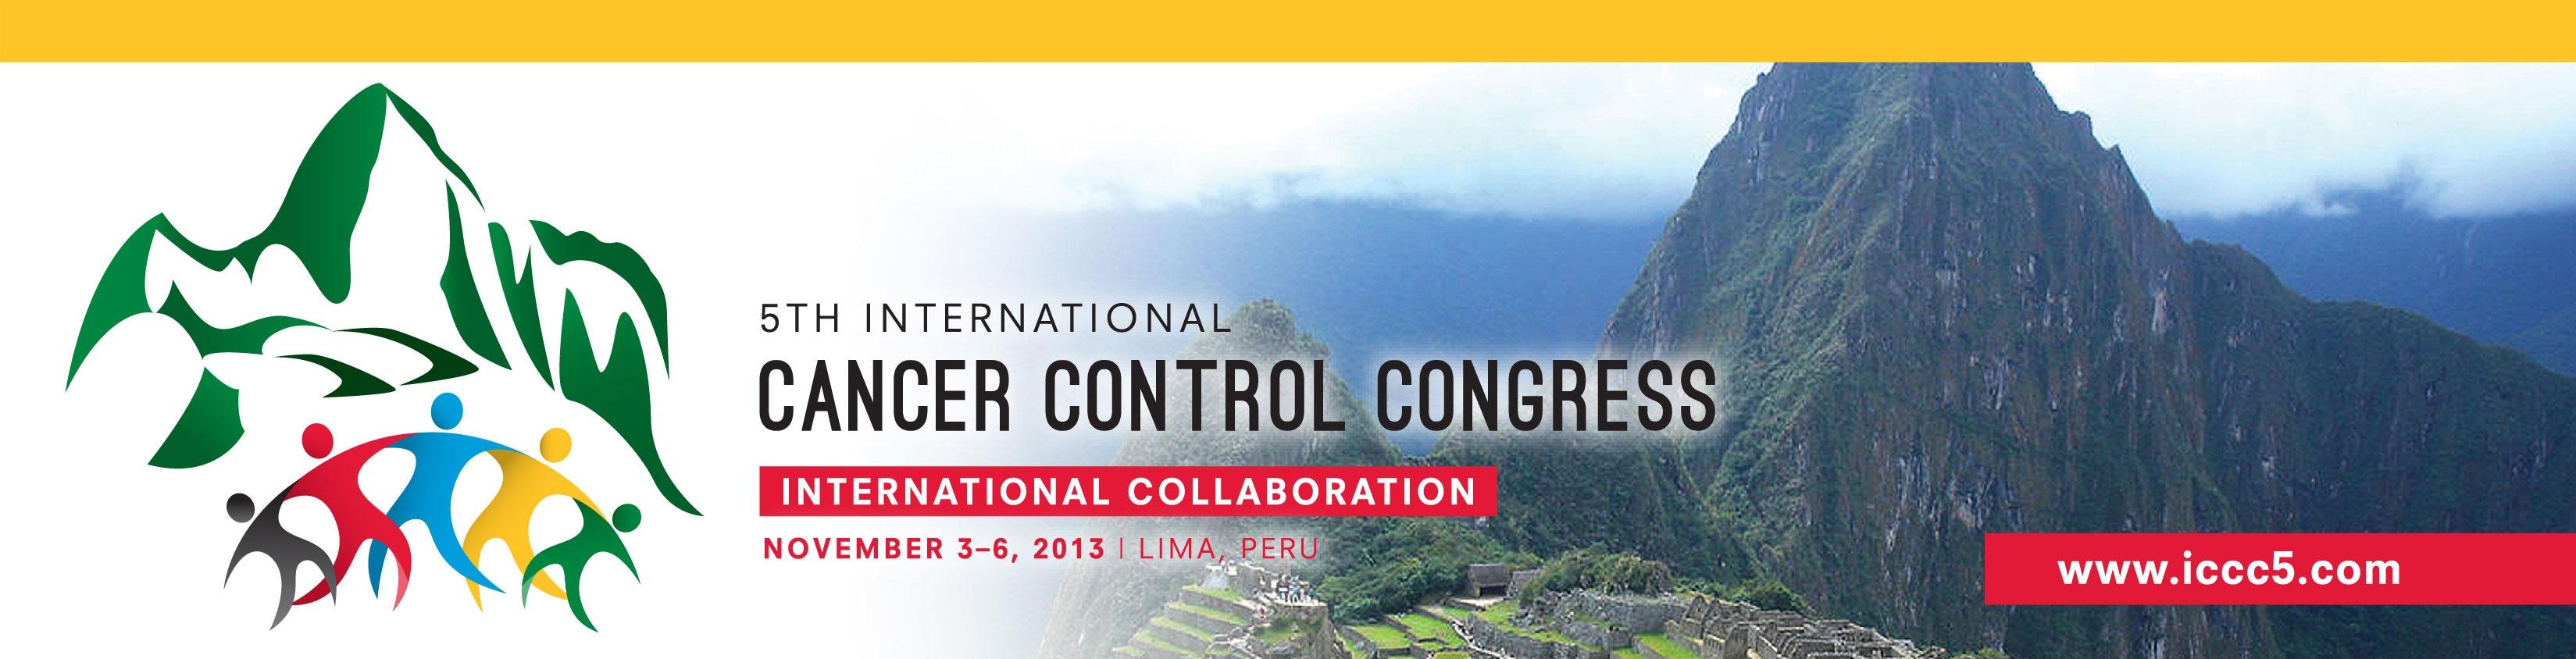 5th International Cancer Control Congress